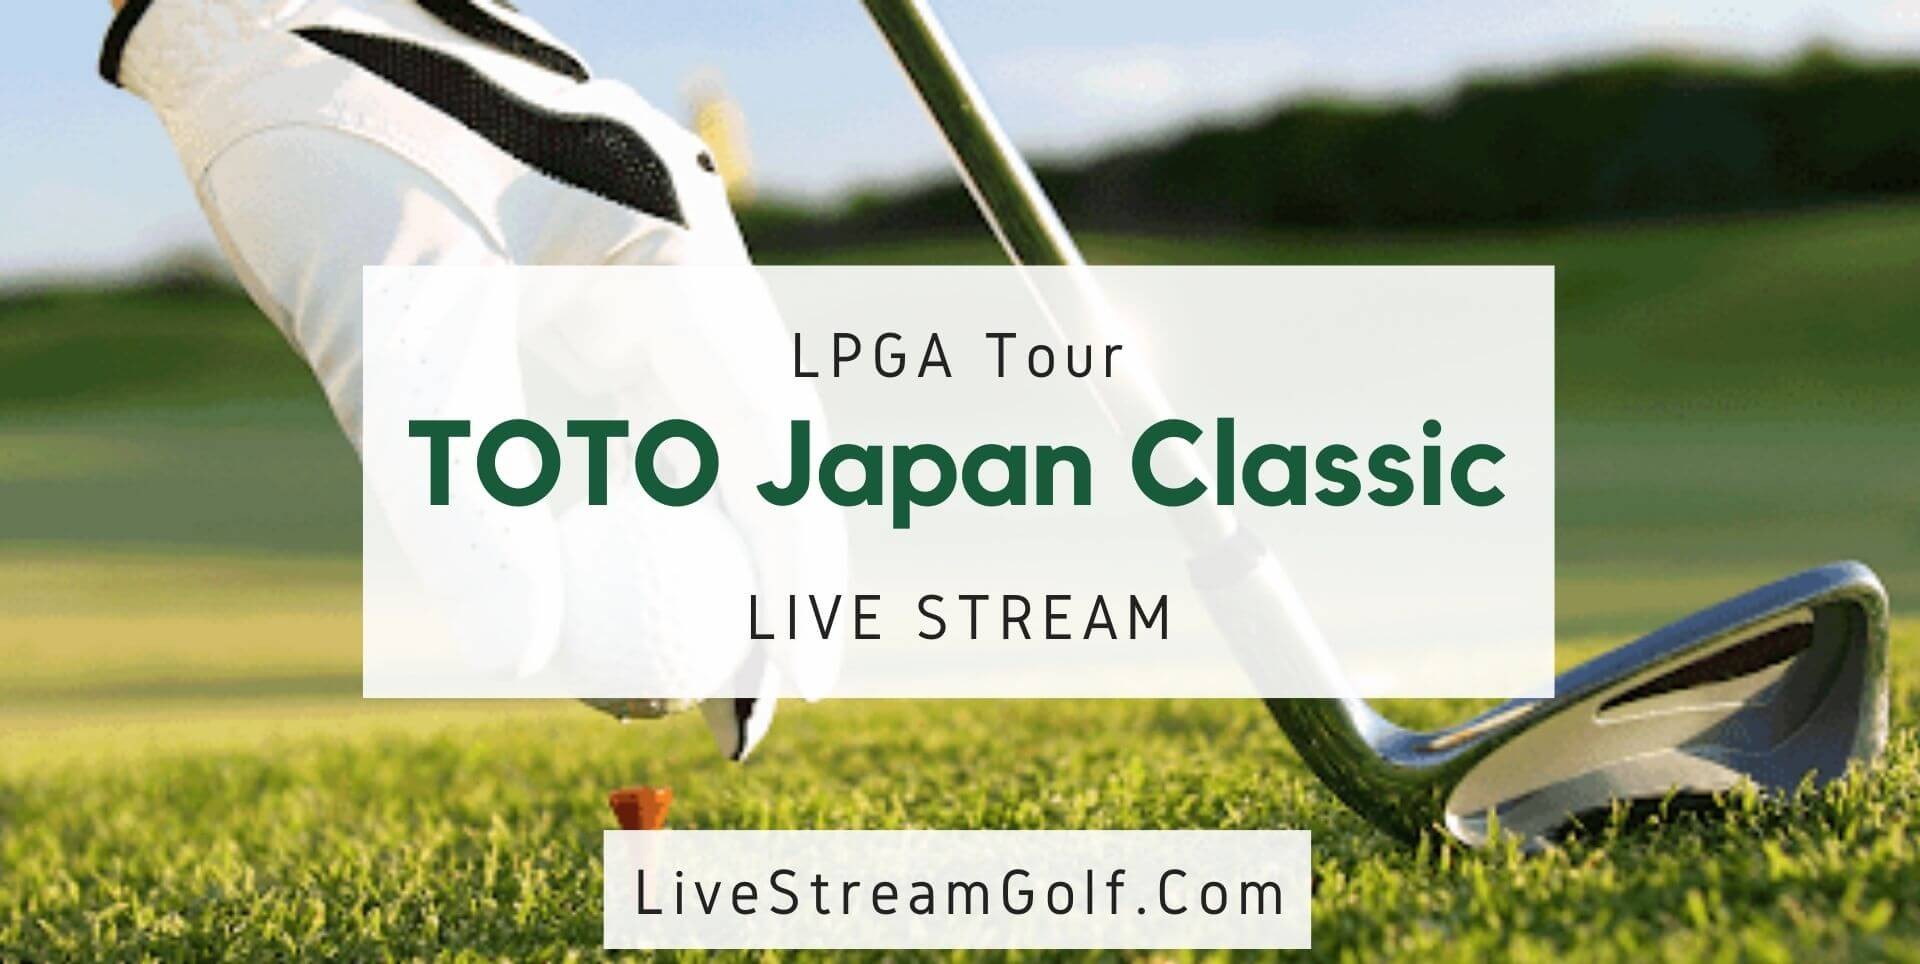 TOTO Japan Classic Rd 2 Live Stream: LPGA Tour 2021